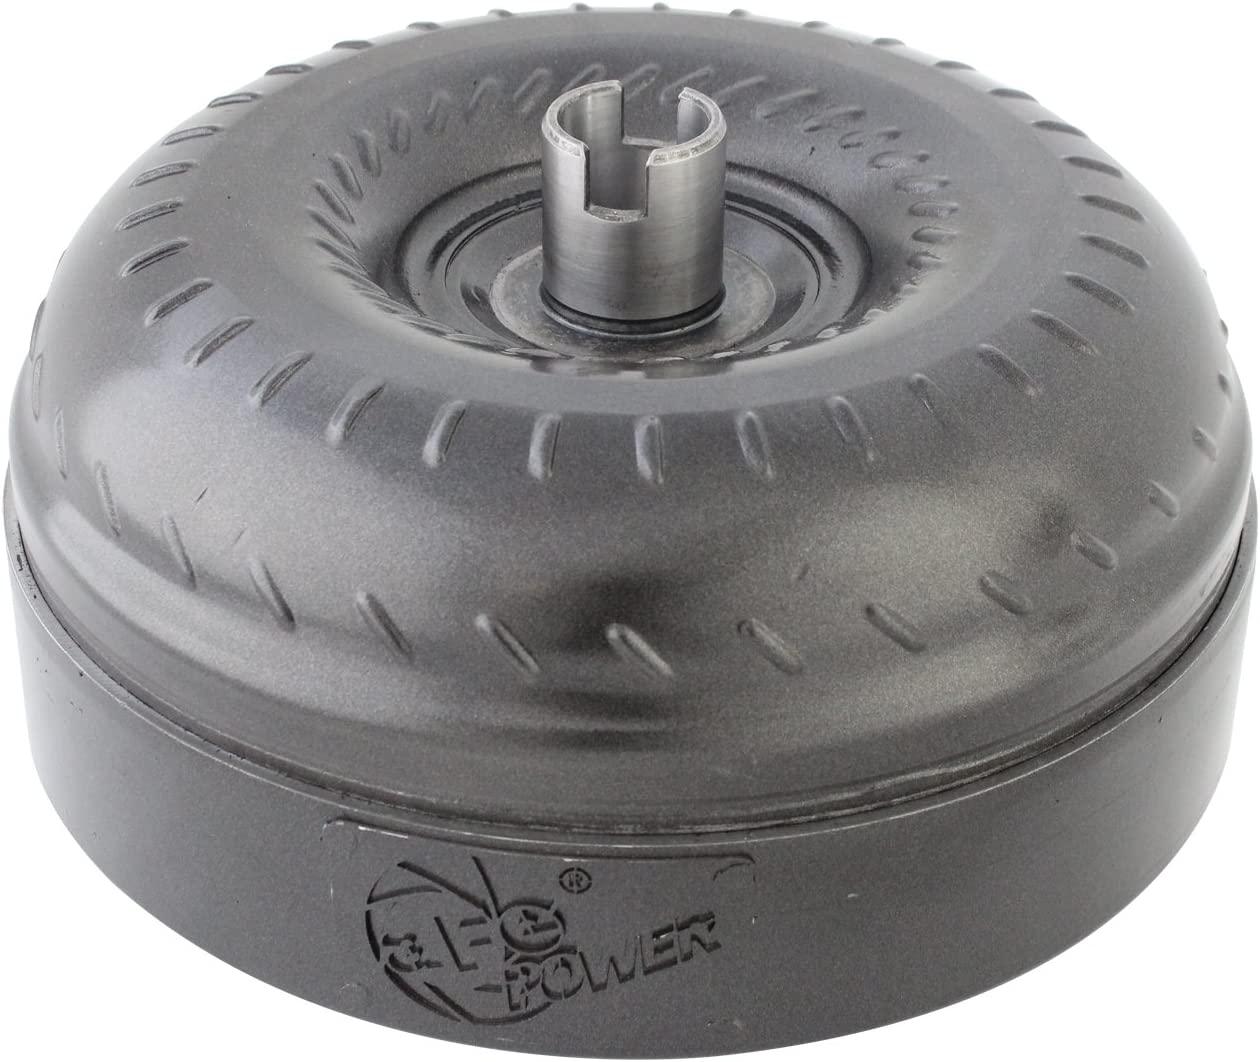 aFe 43-13031 F3 Torque Converter for Ford